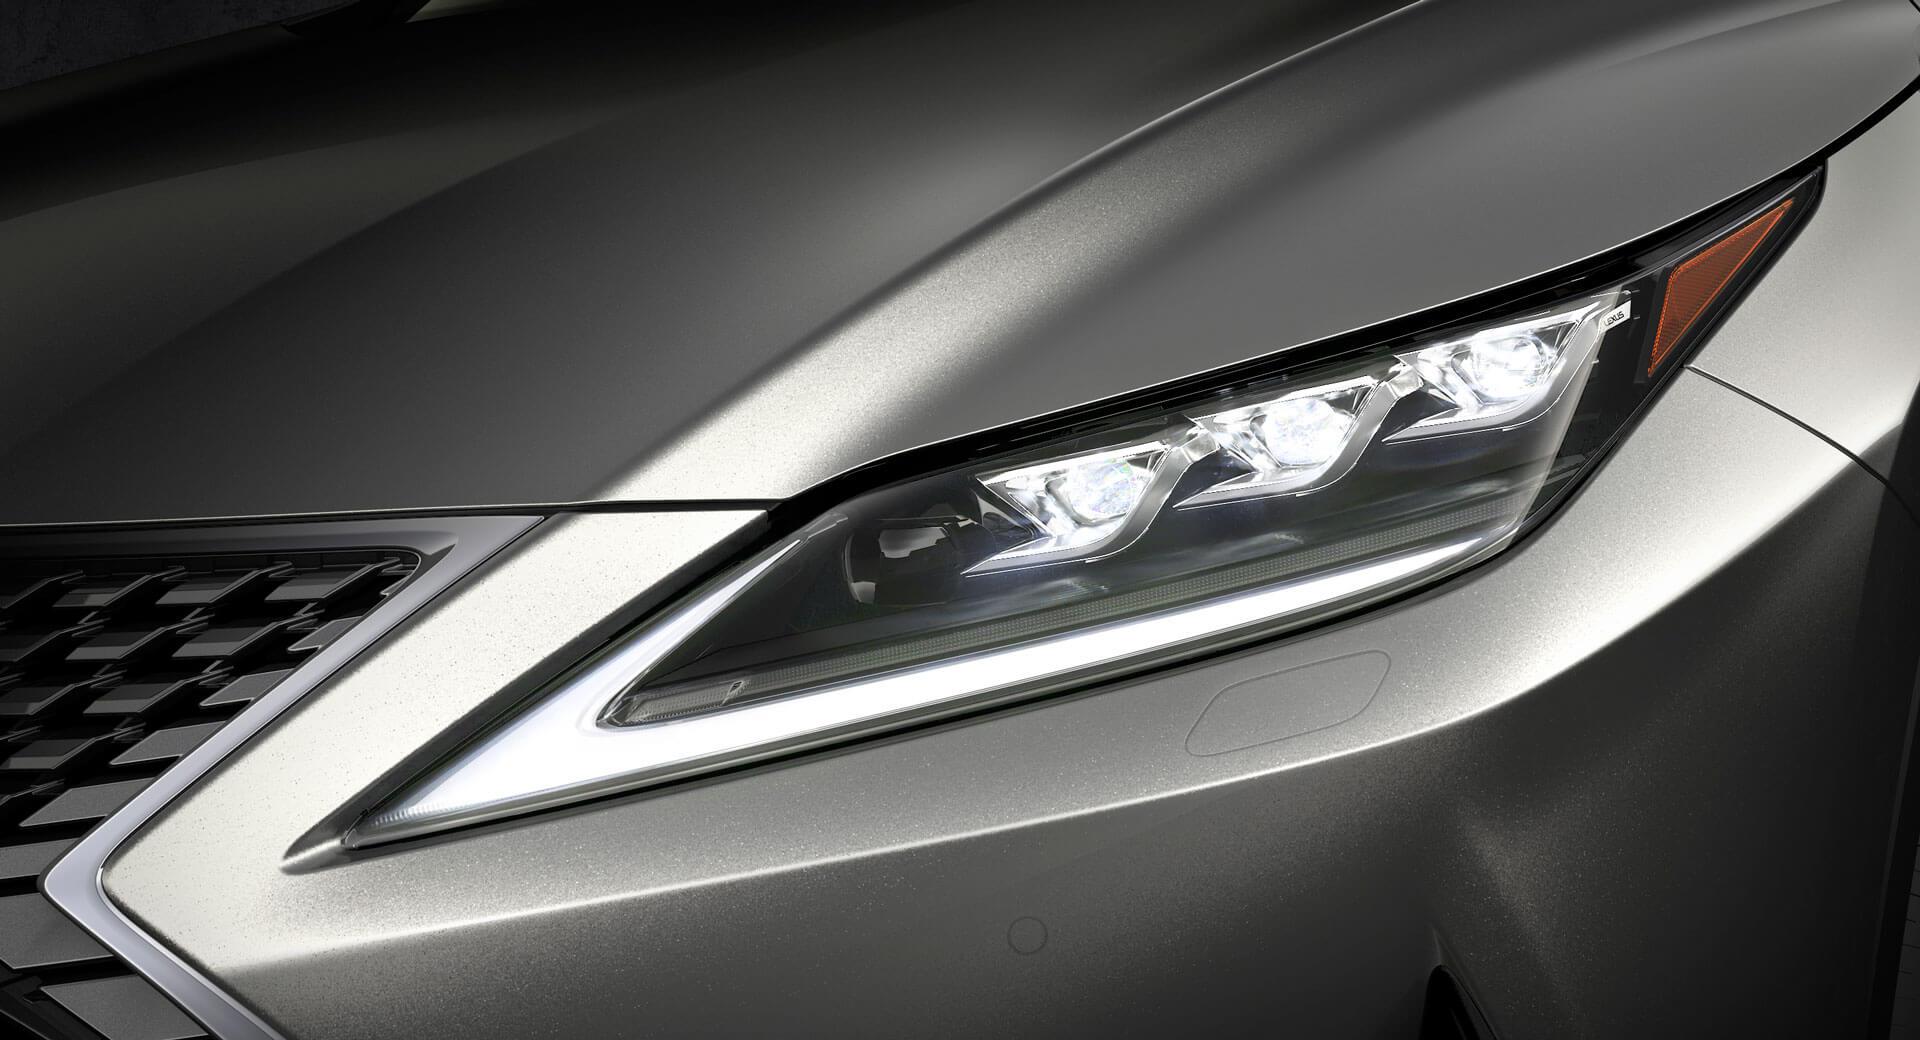 Remarkable 2020 Lexus Rx Getting Innovative Led Headlights As A World First Wiring Cloud Licukosporaidewilluminateatxorg